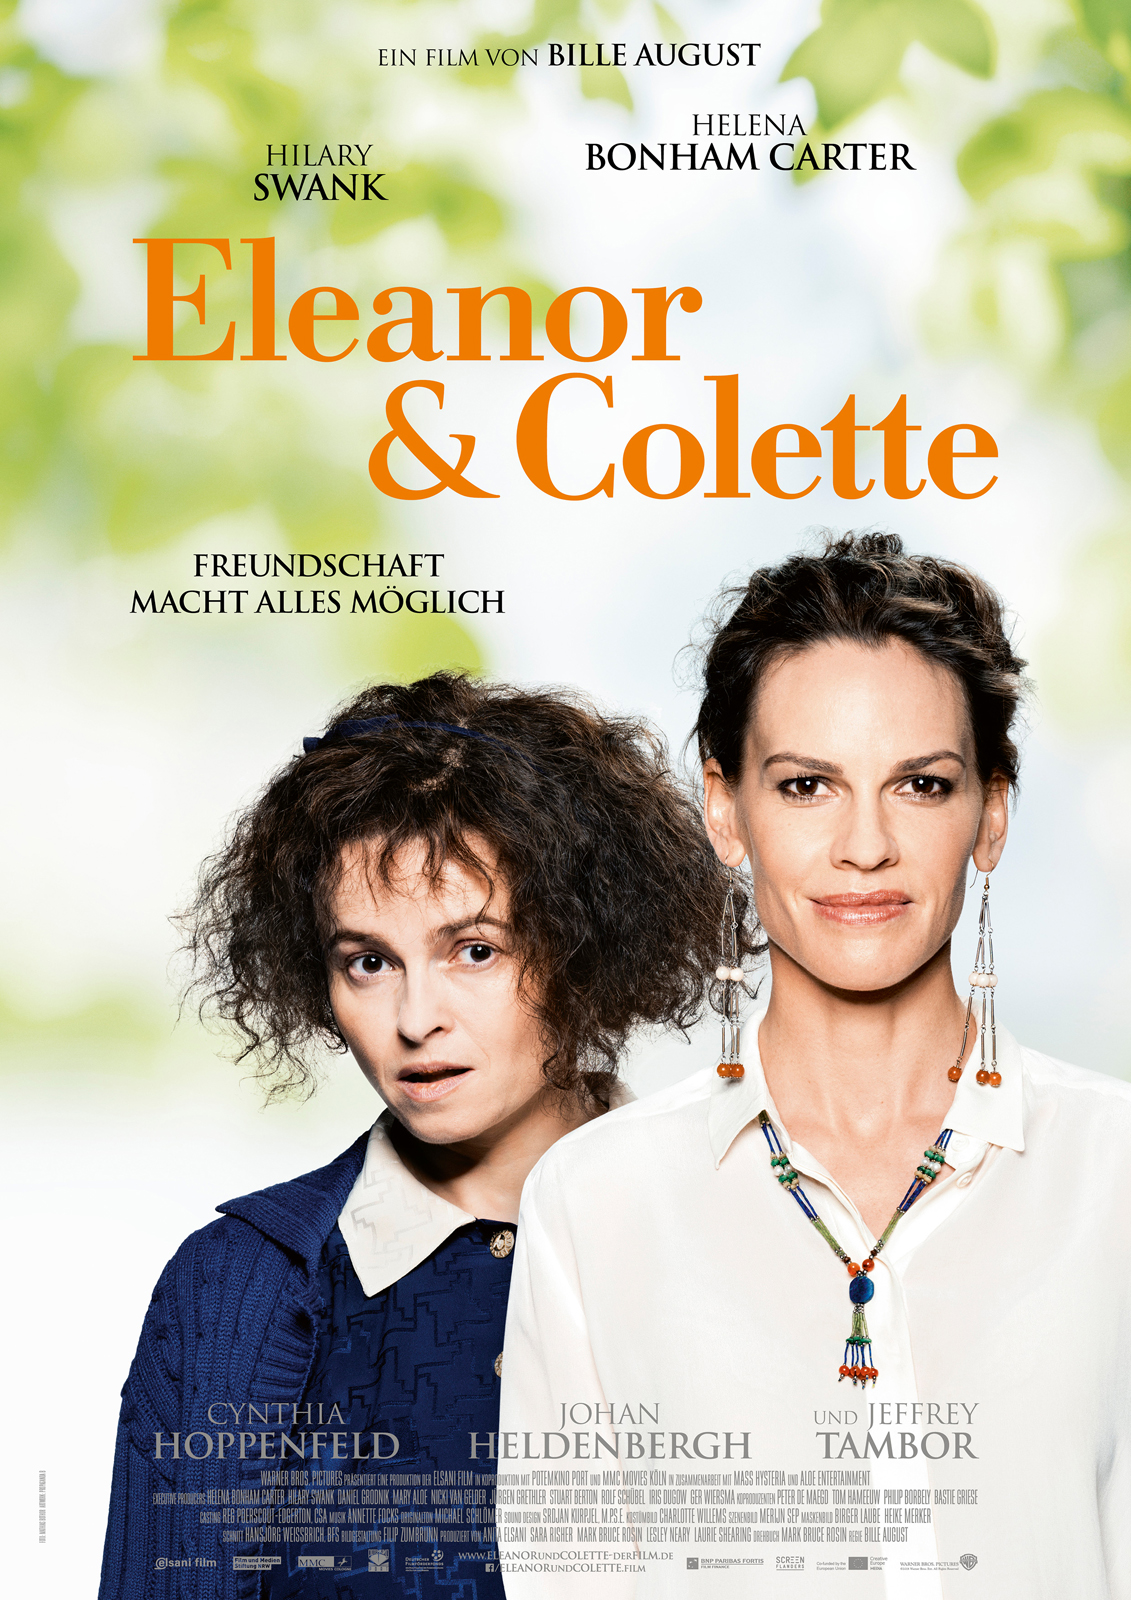 Eleanor Colette ähnliche Filme Filmstarts De